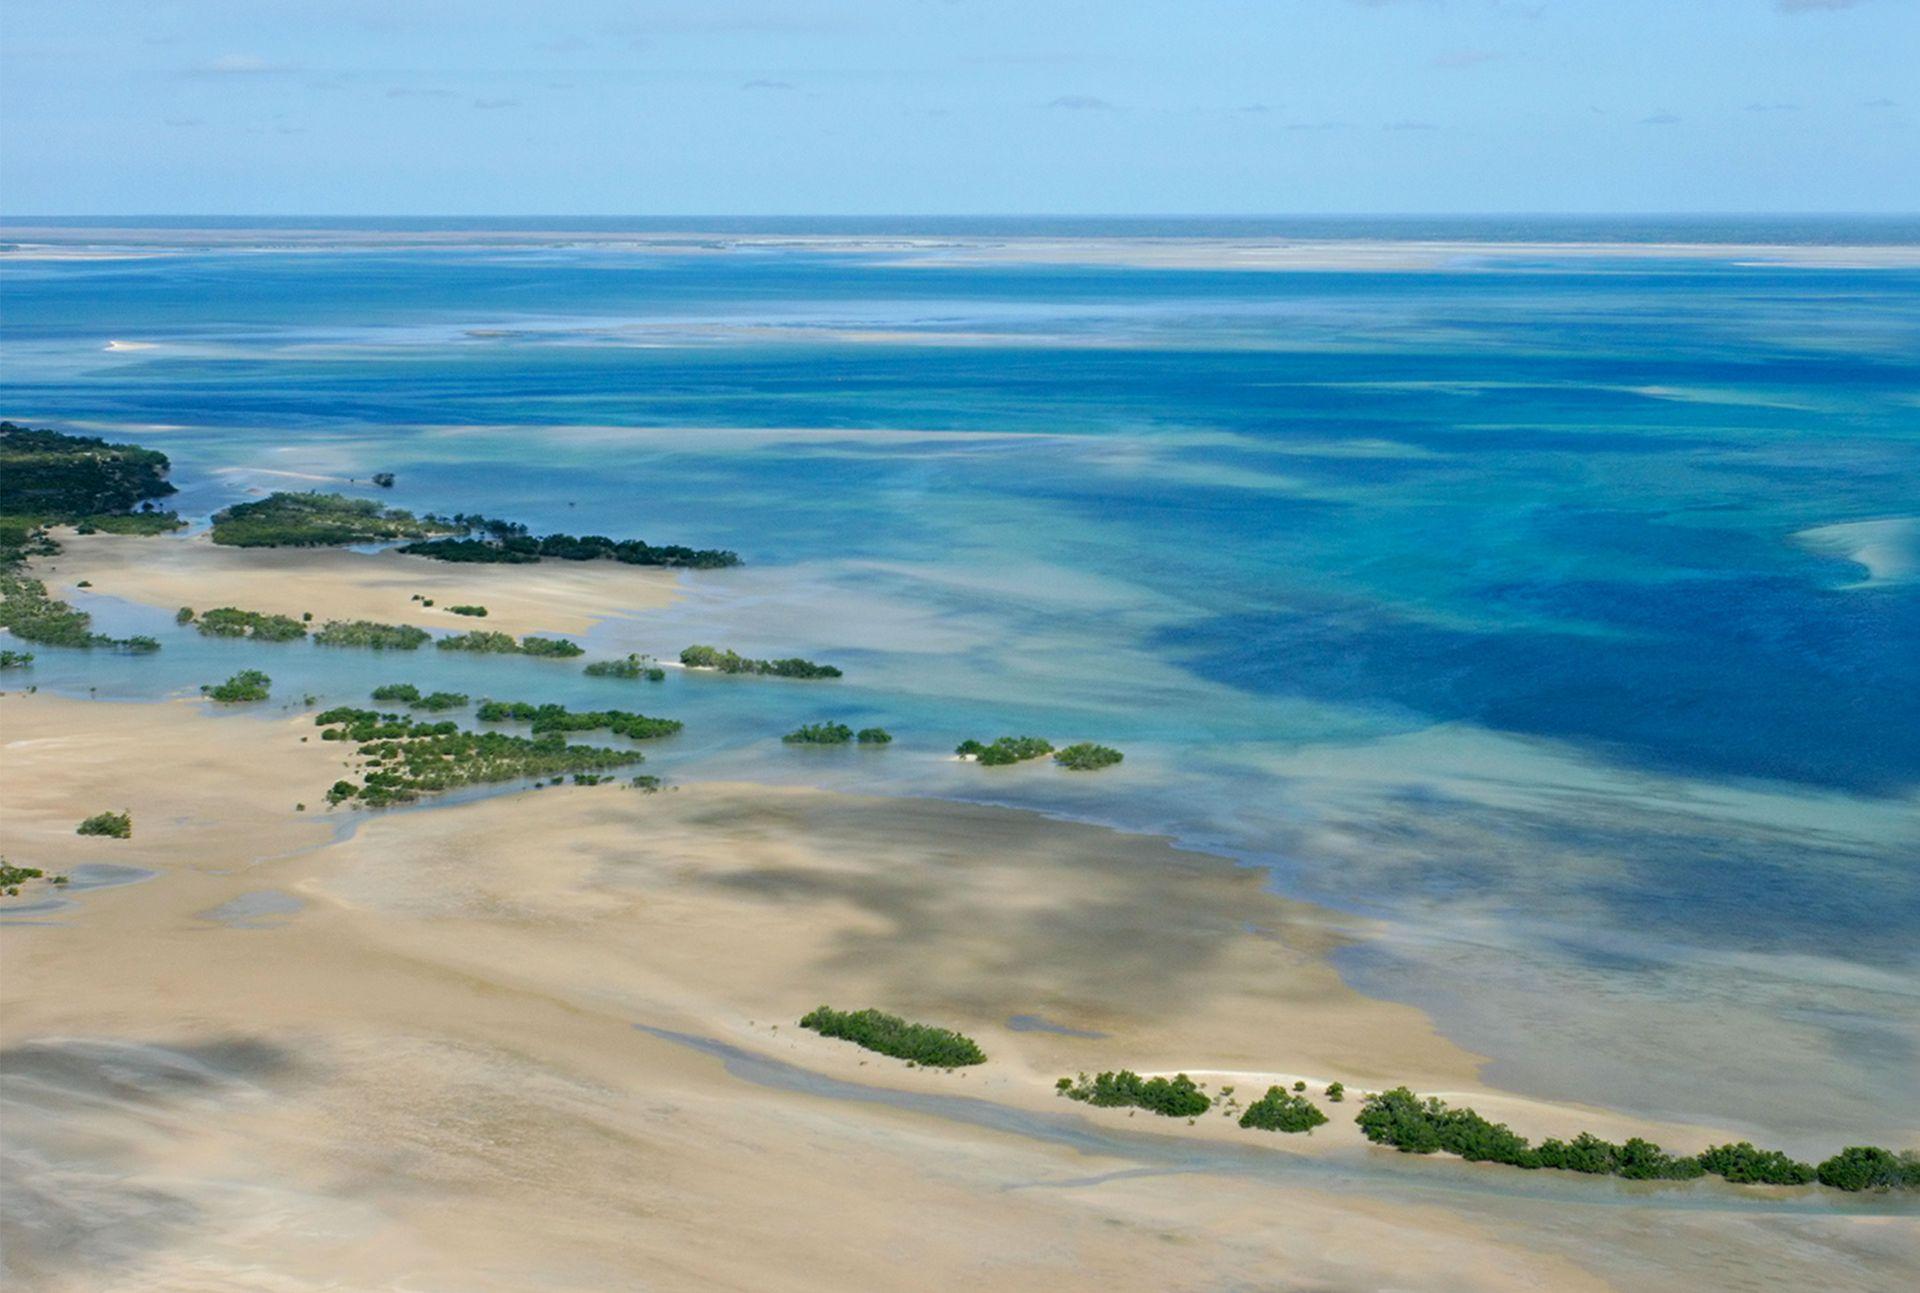 Freiwilligenarbeit Mosambik Erfahrungsberichte